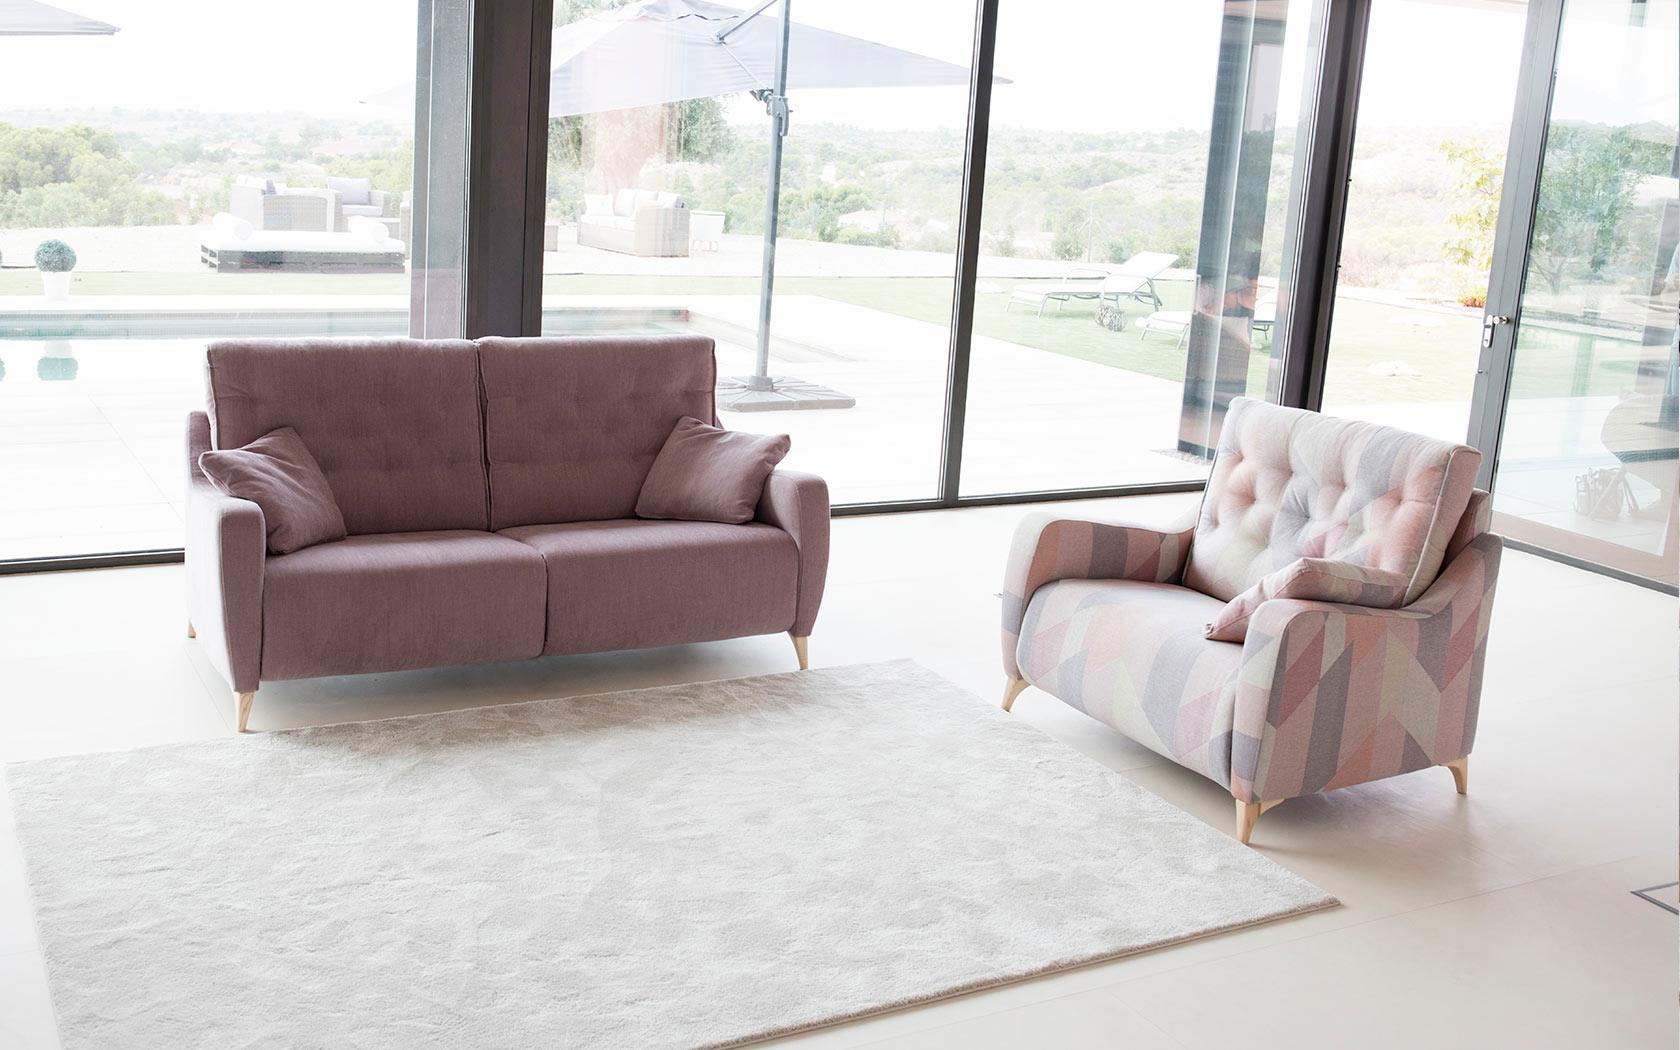 Avalon sofa relax 2019 04